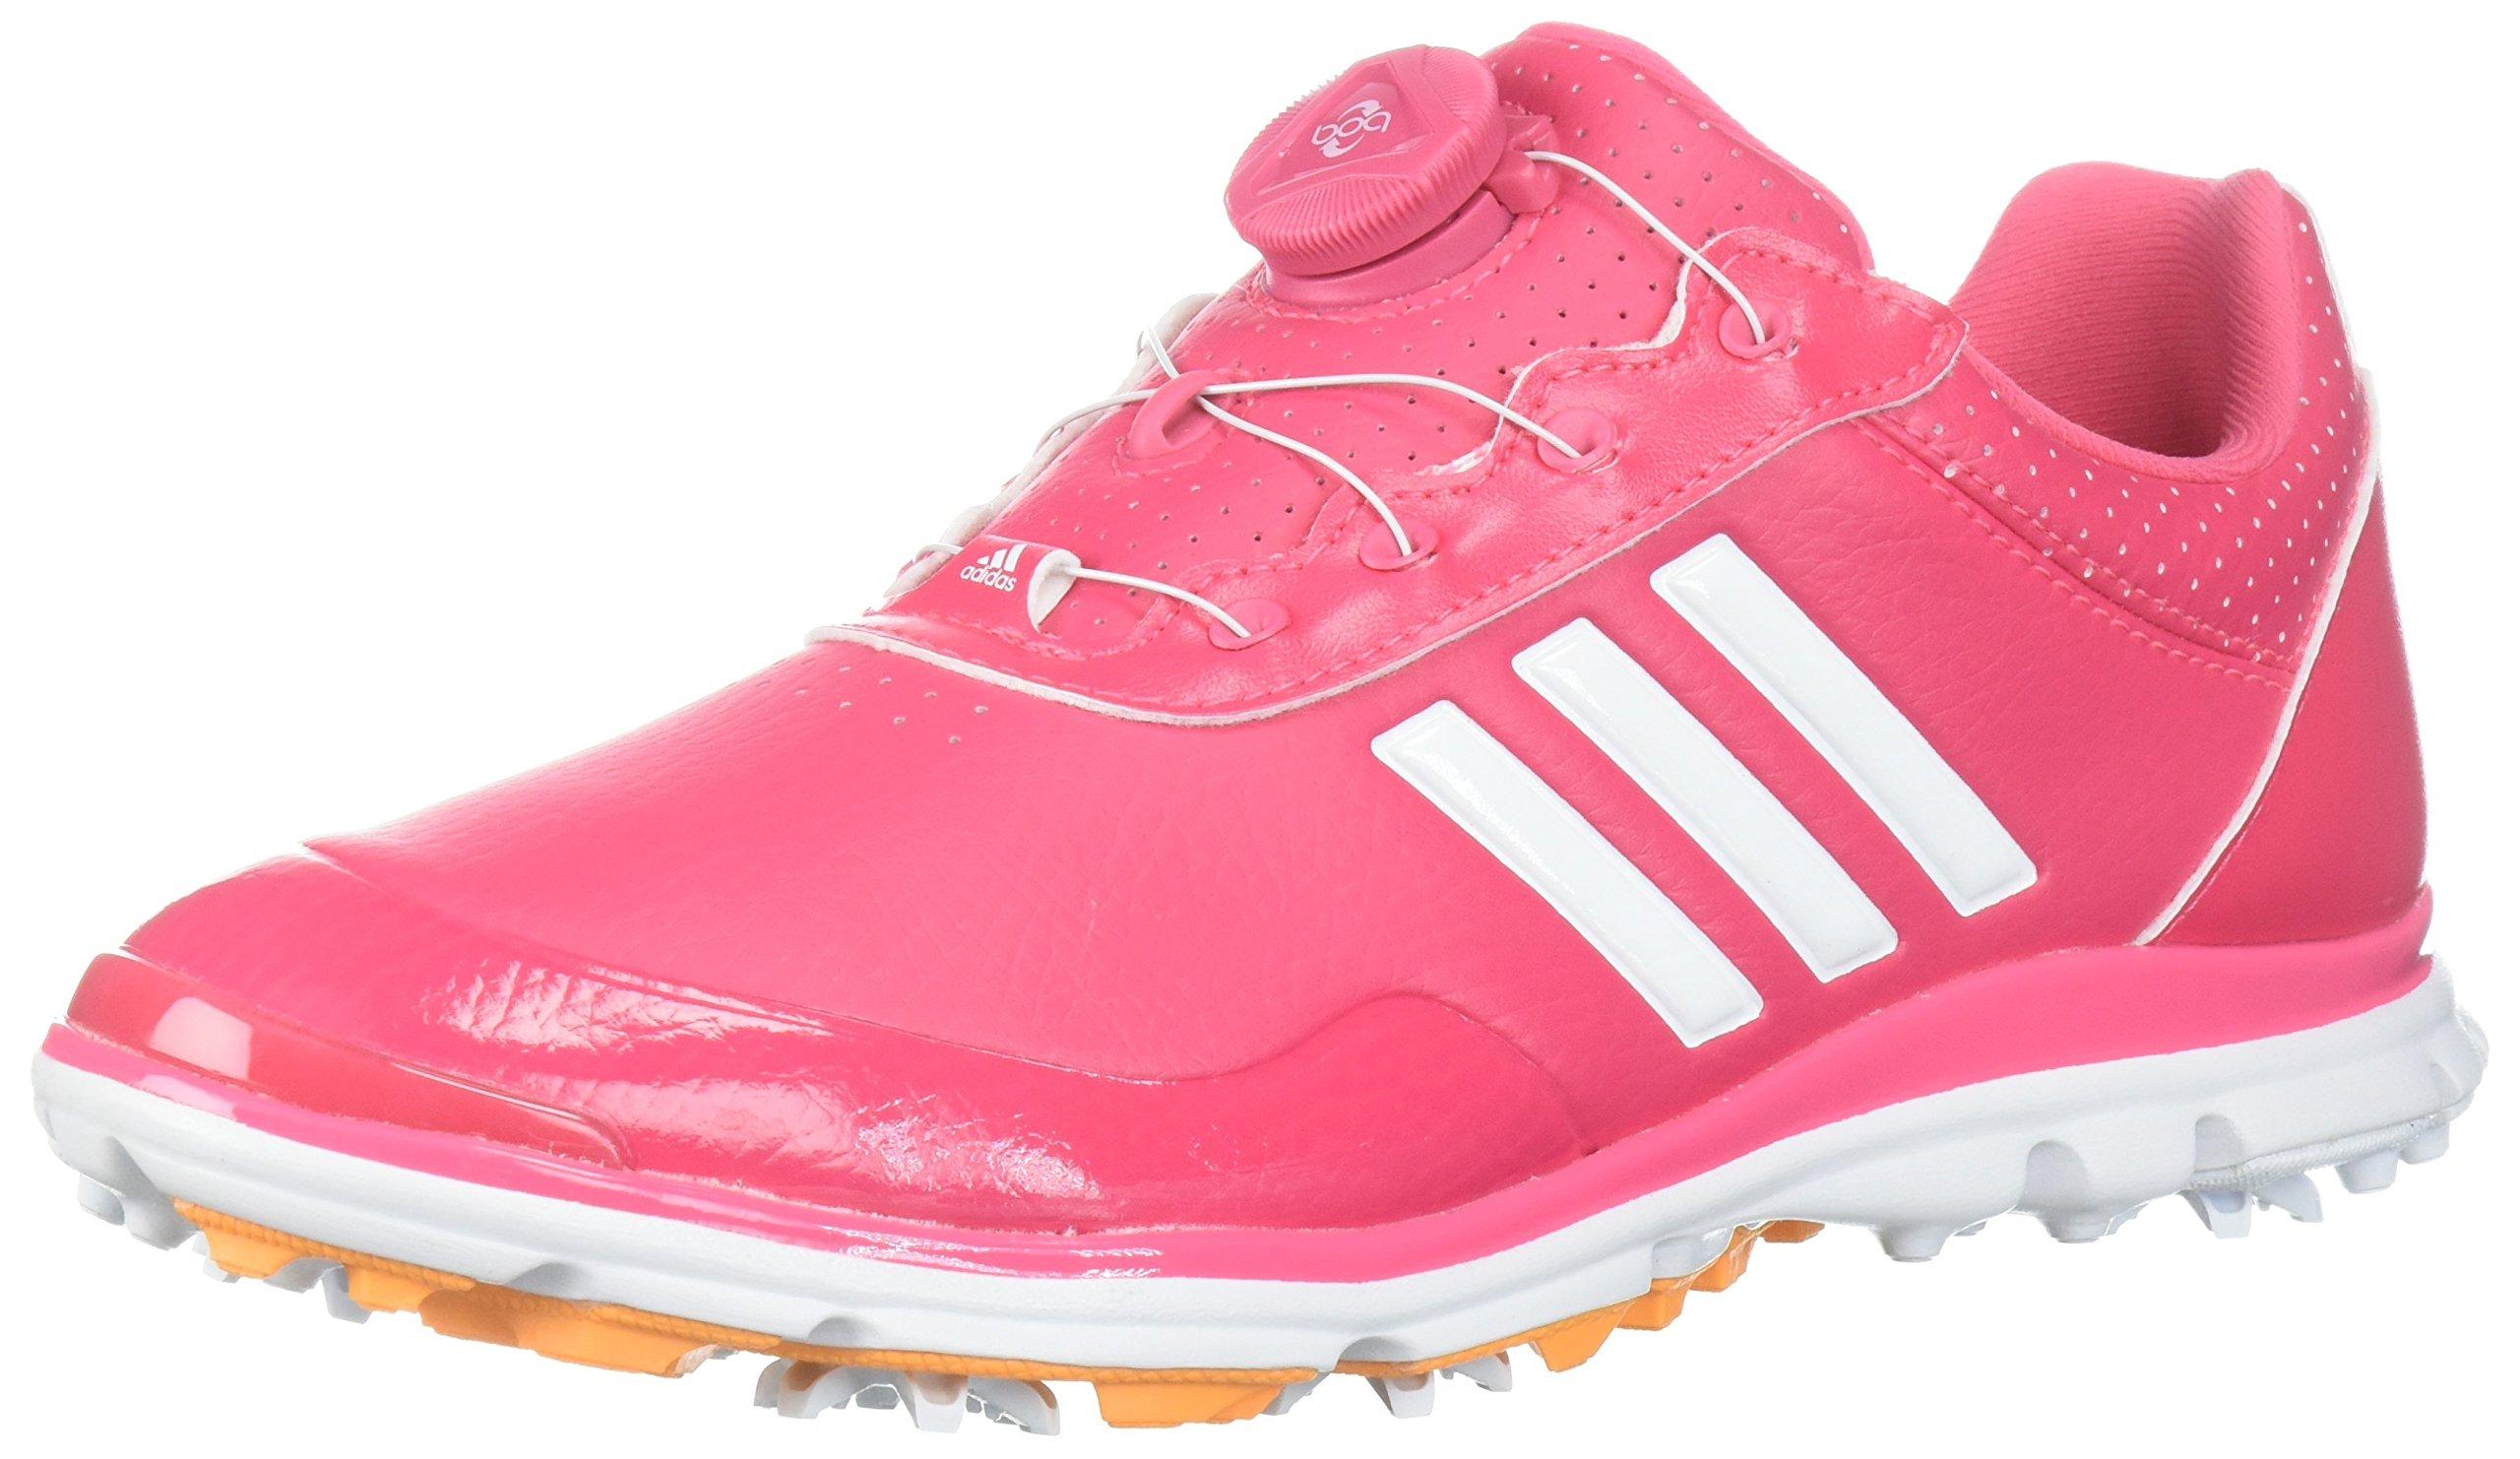 adidas Women's Adistar Lite BOA Golf Shoe, Real Pink/White/Real Gold, 9.5 M US